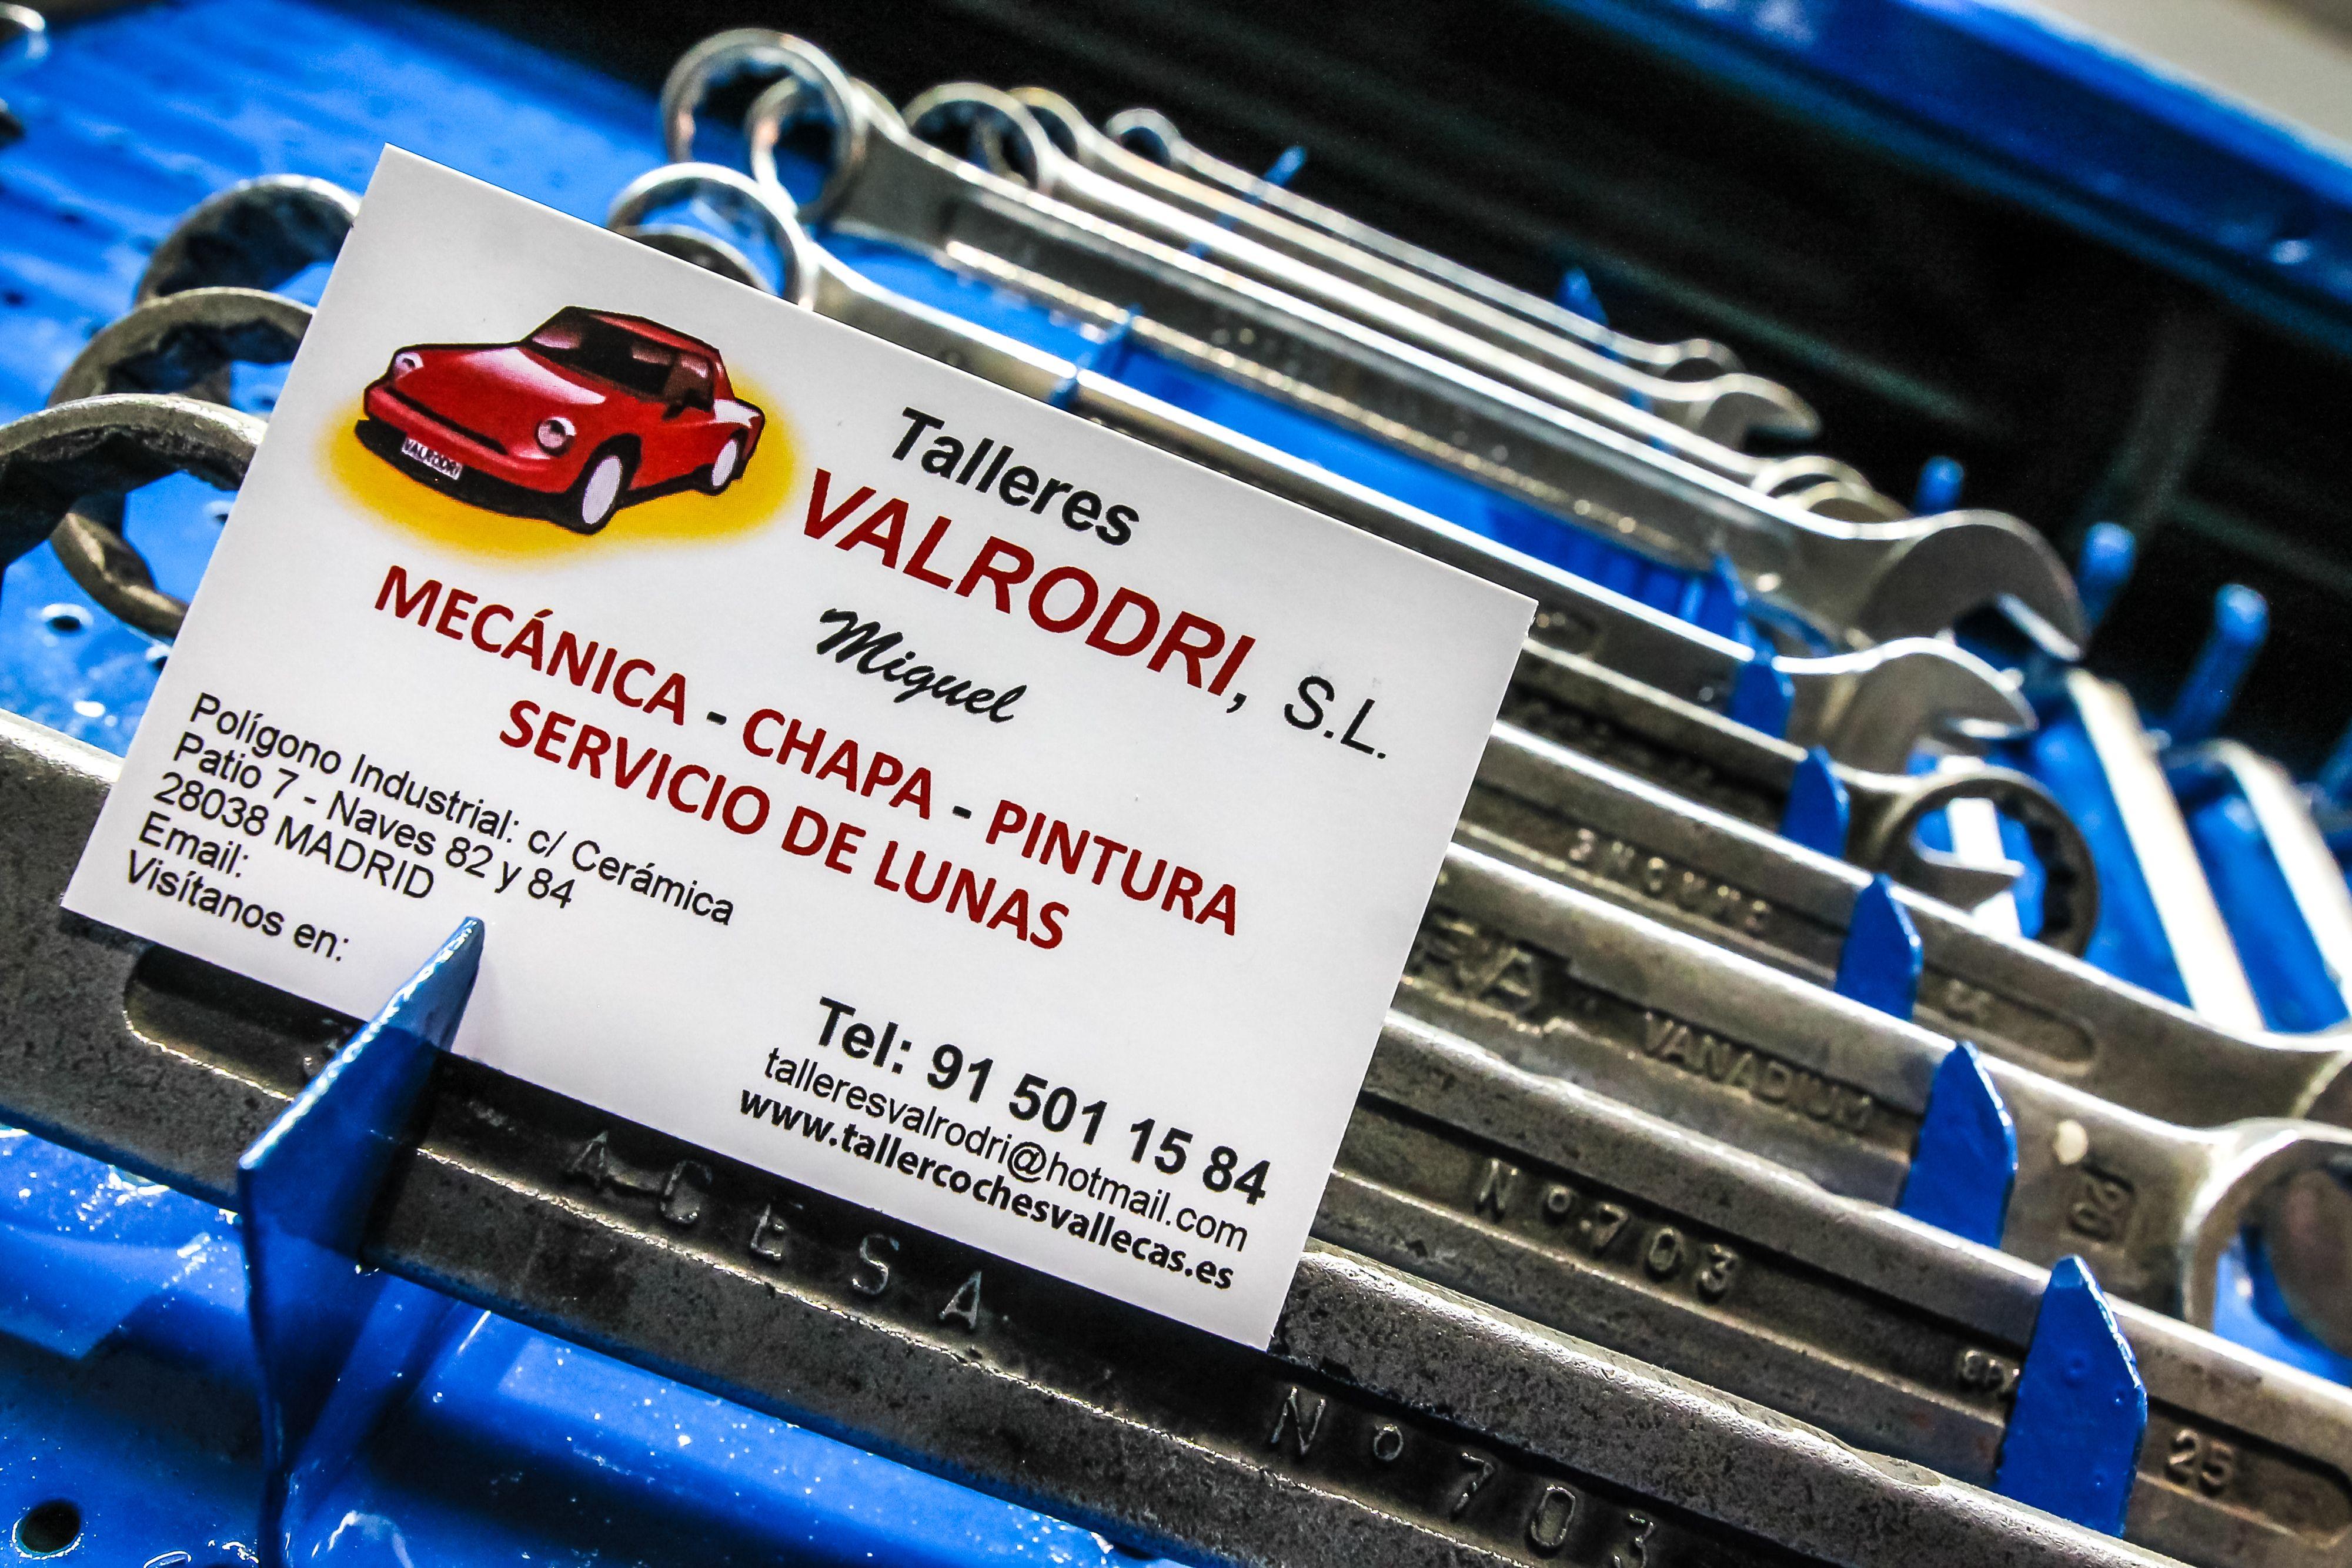 Foto 3 de Talleres de automóviles en Madrid | Talleres Valrodri